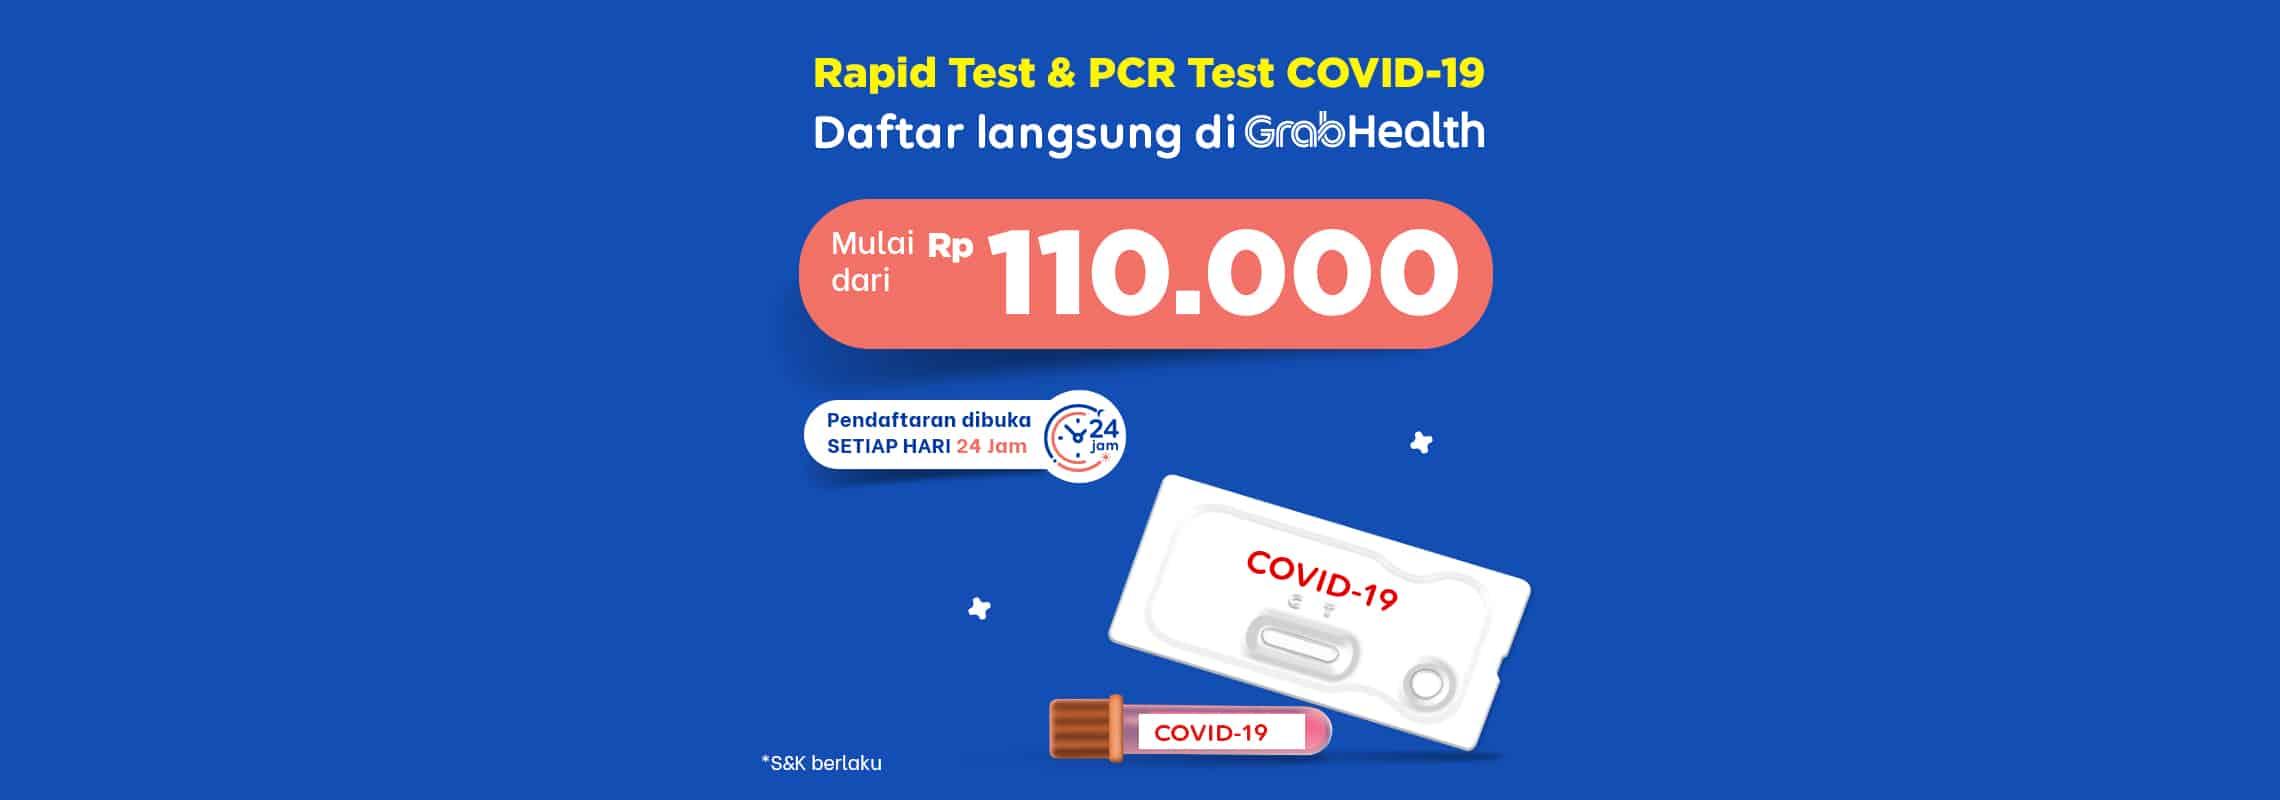 Rapid dan PCR Test